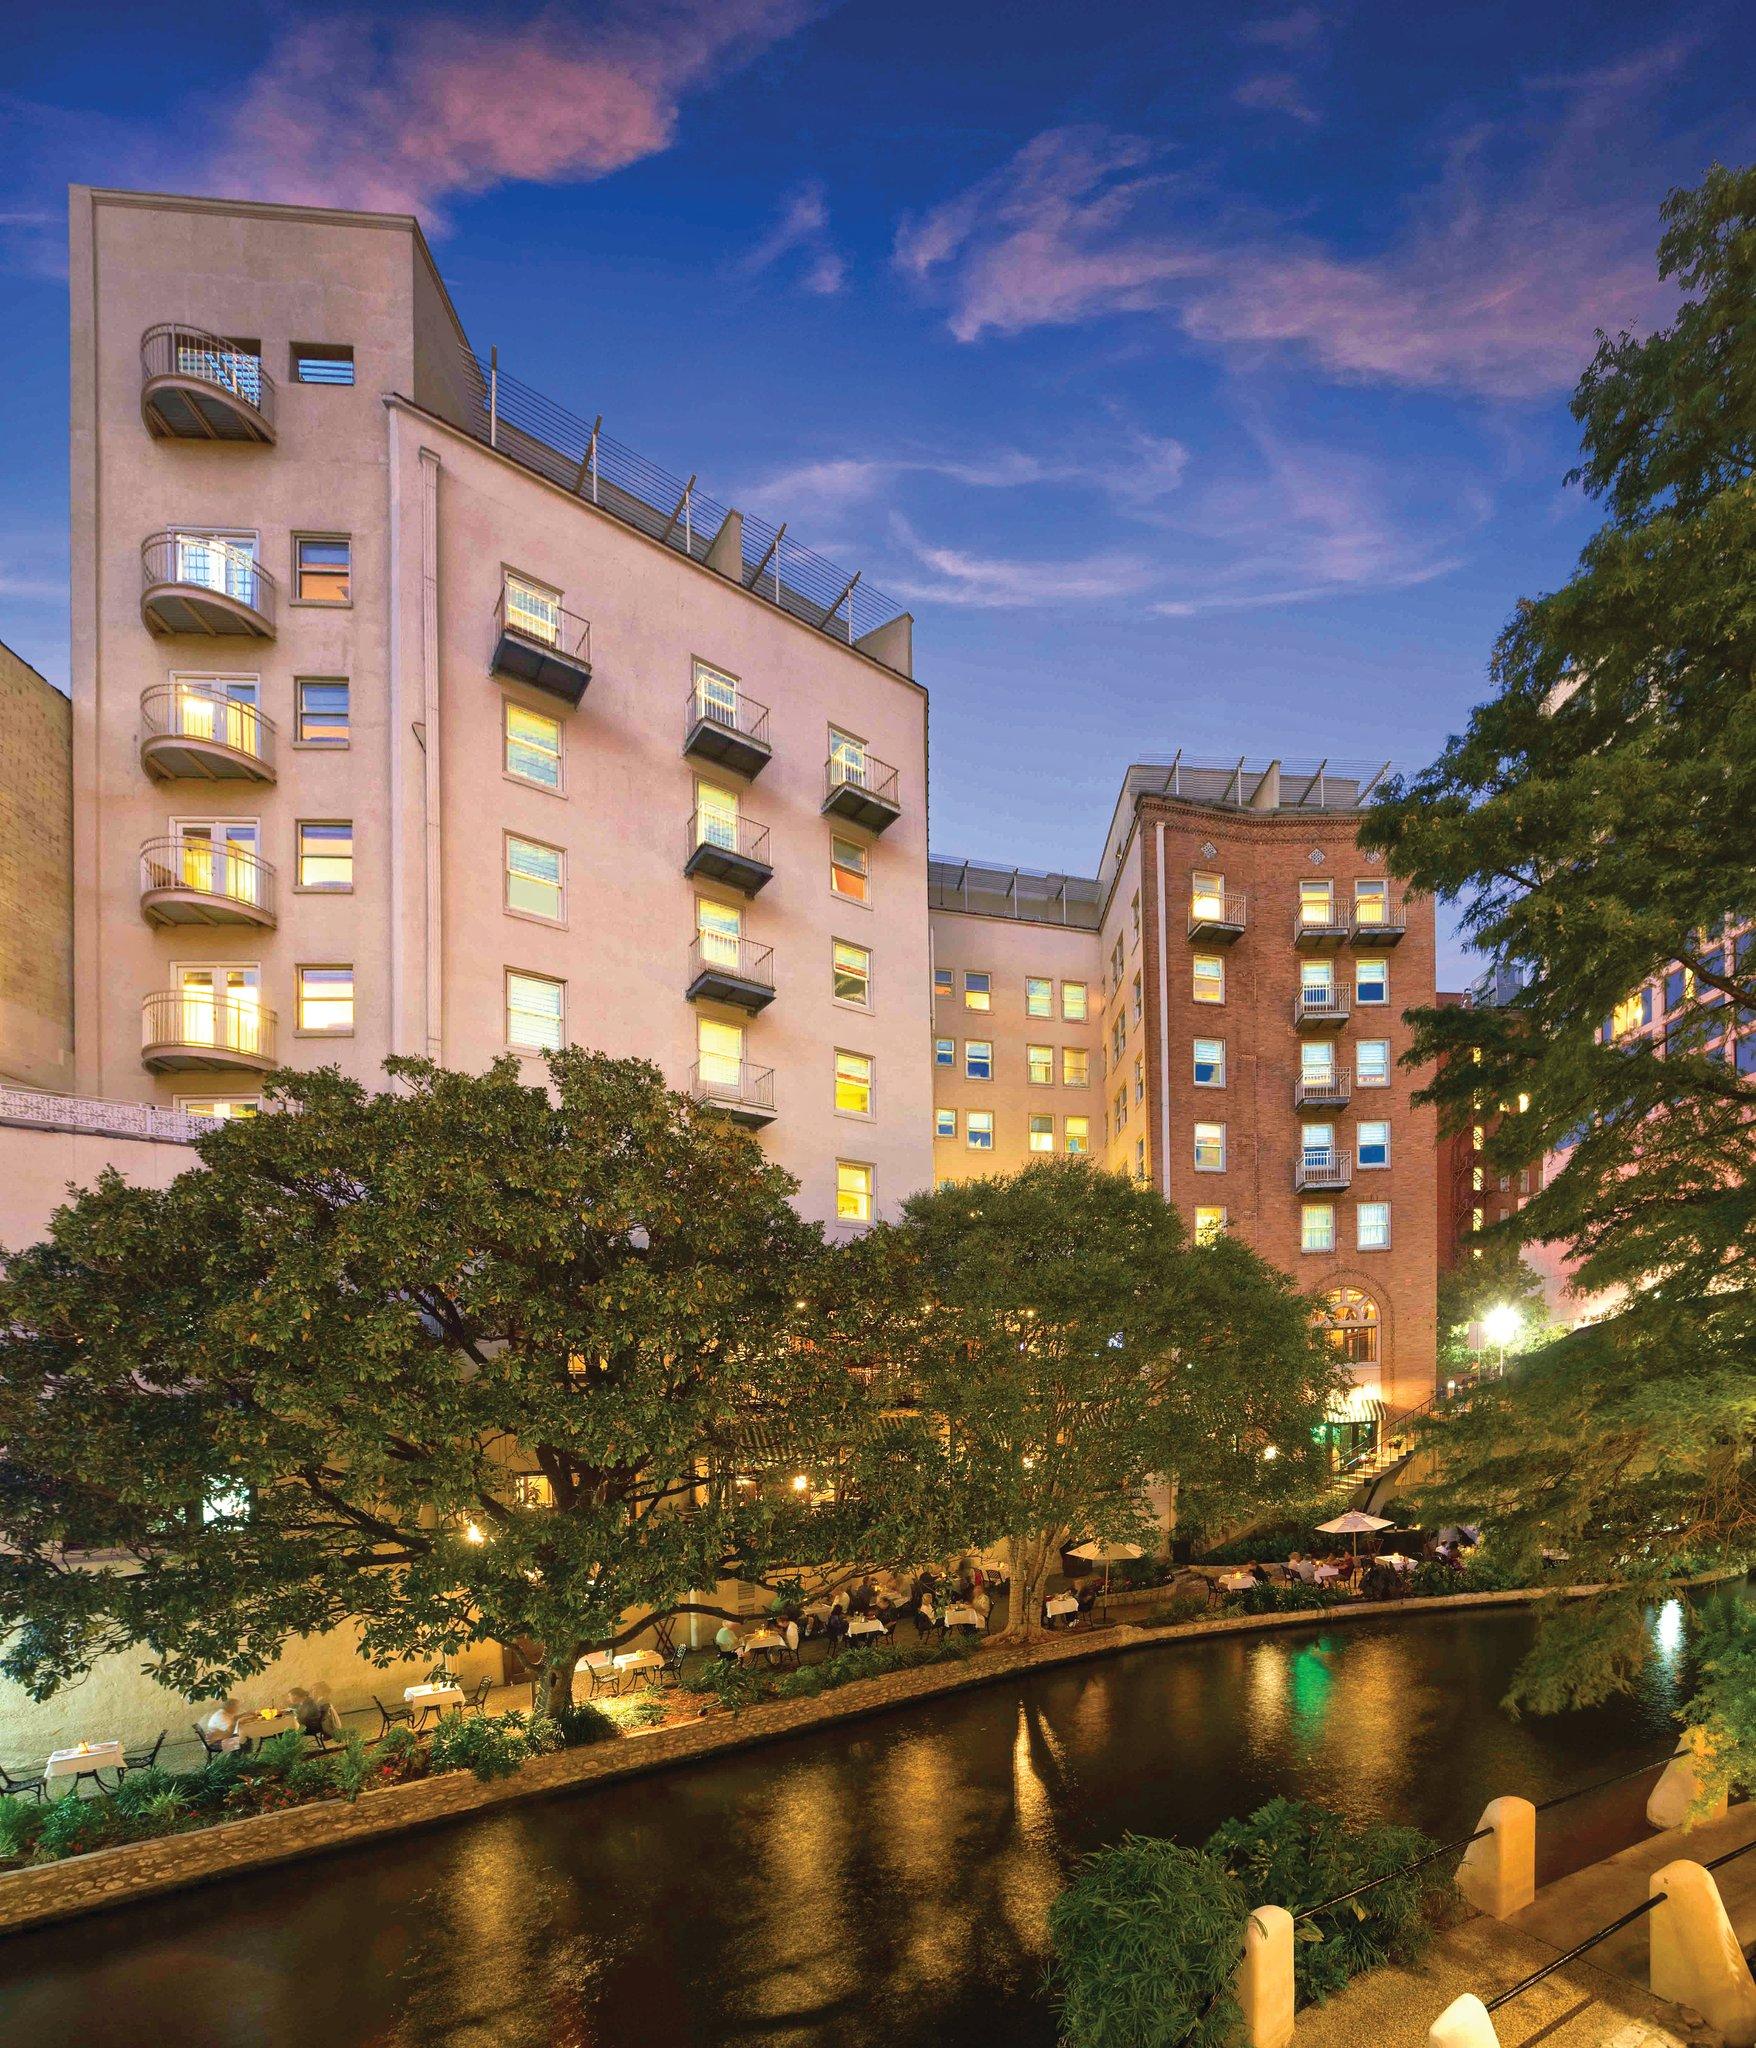 Wyndham Riverside Suites | Wyndham Riverside Suites